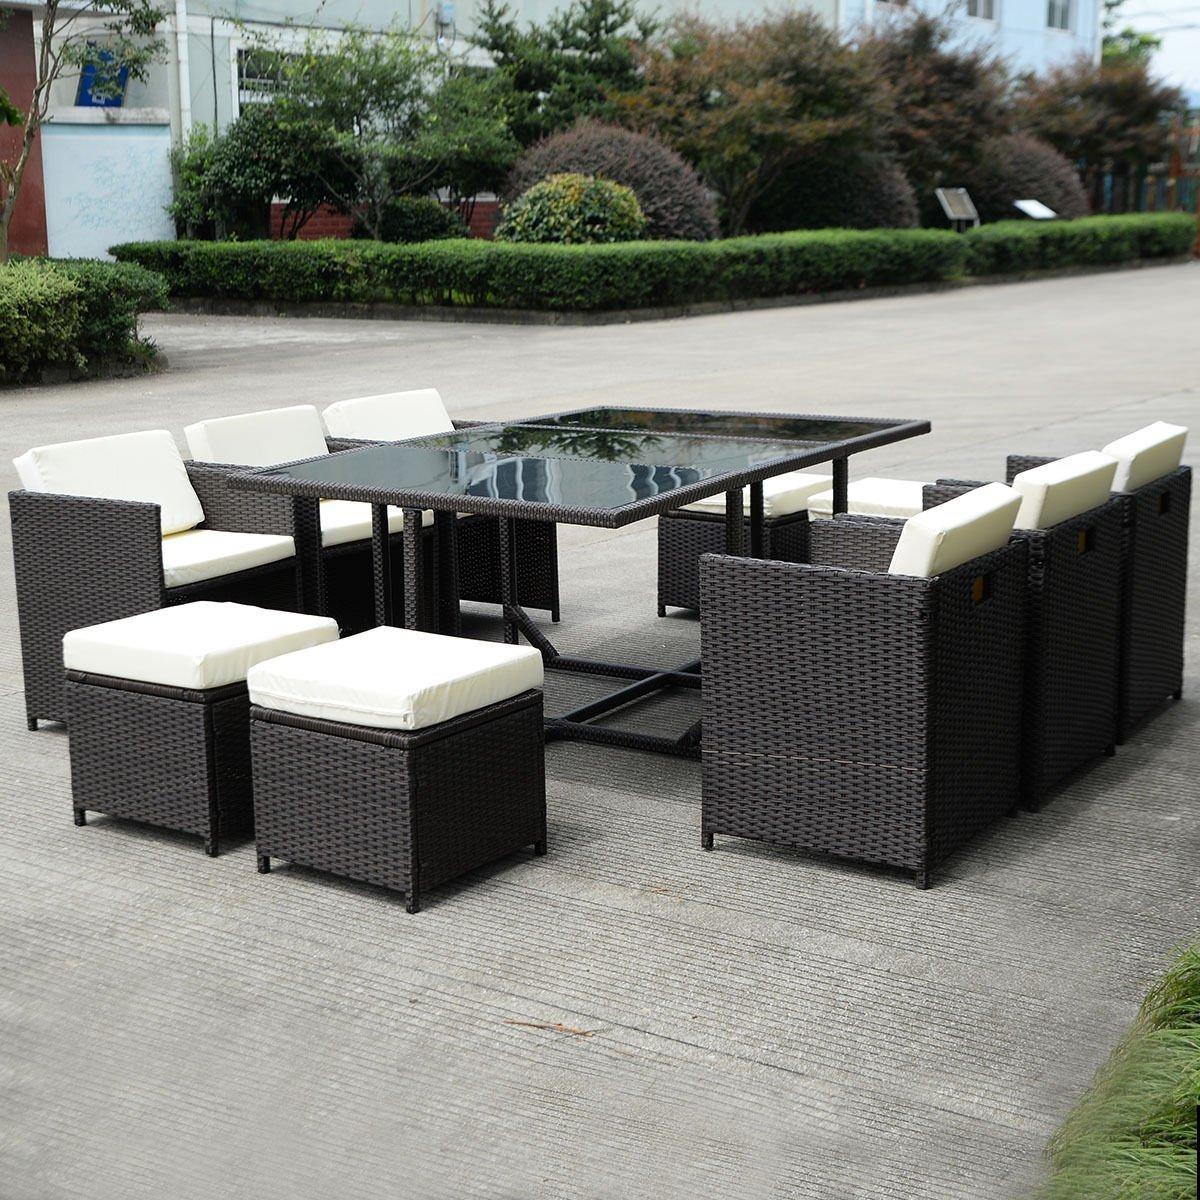 TANGKULA Patio Furniture Outdoor Wicker Rattan Dining Set Cushioned Seat Garden Sectional Conversation Sofa